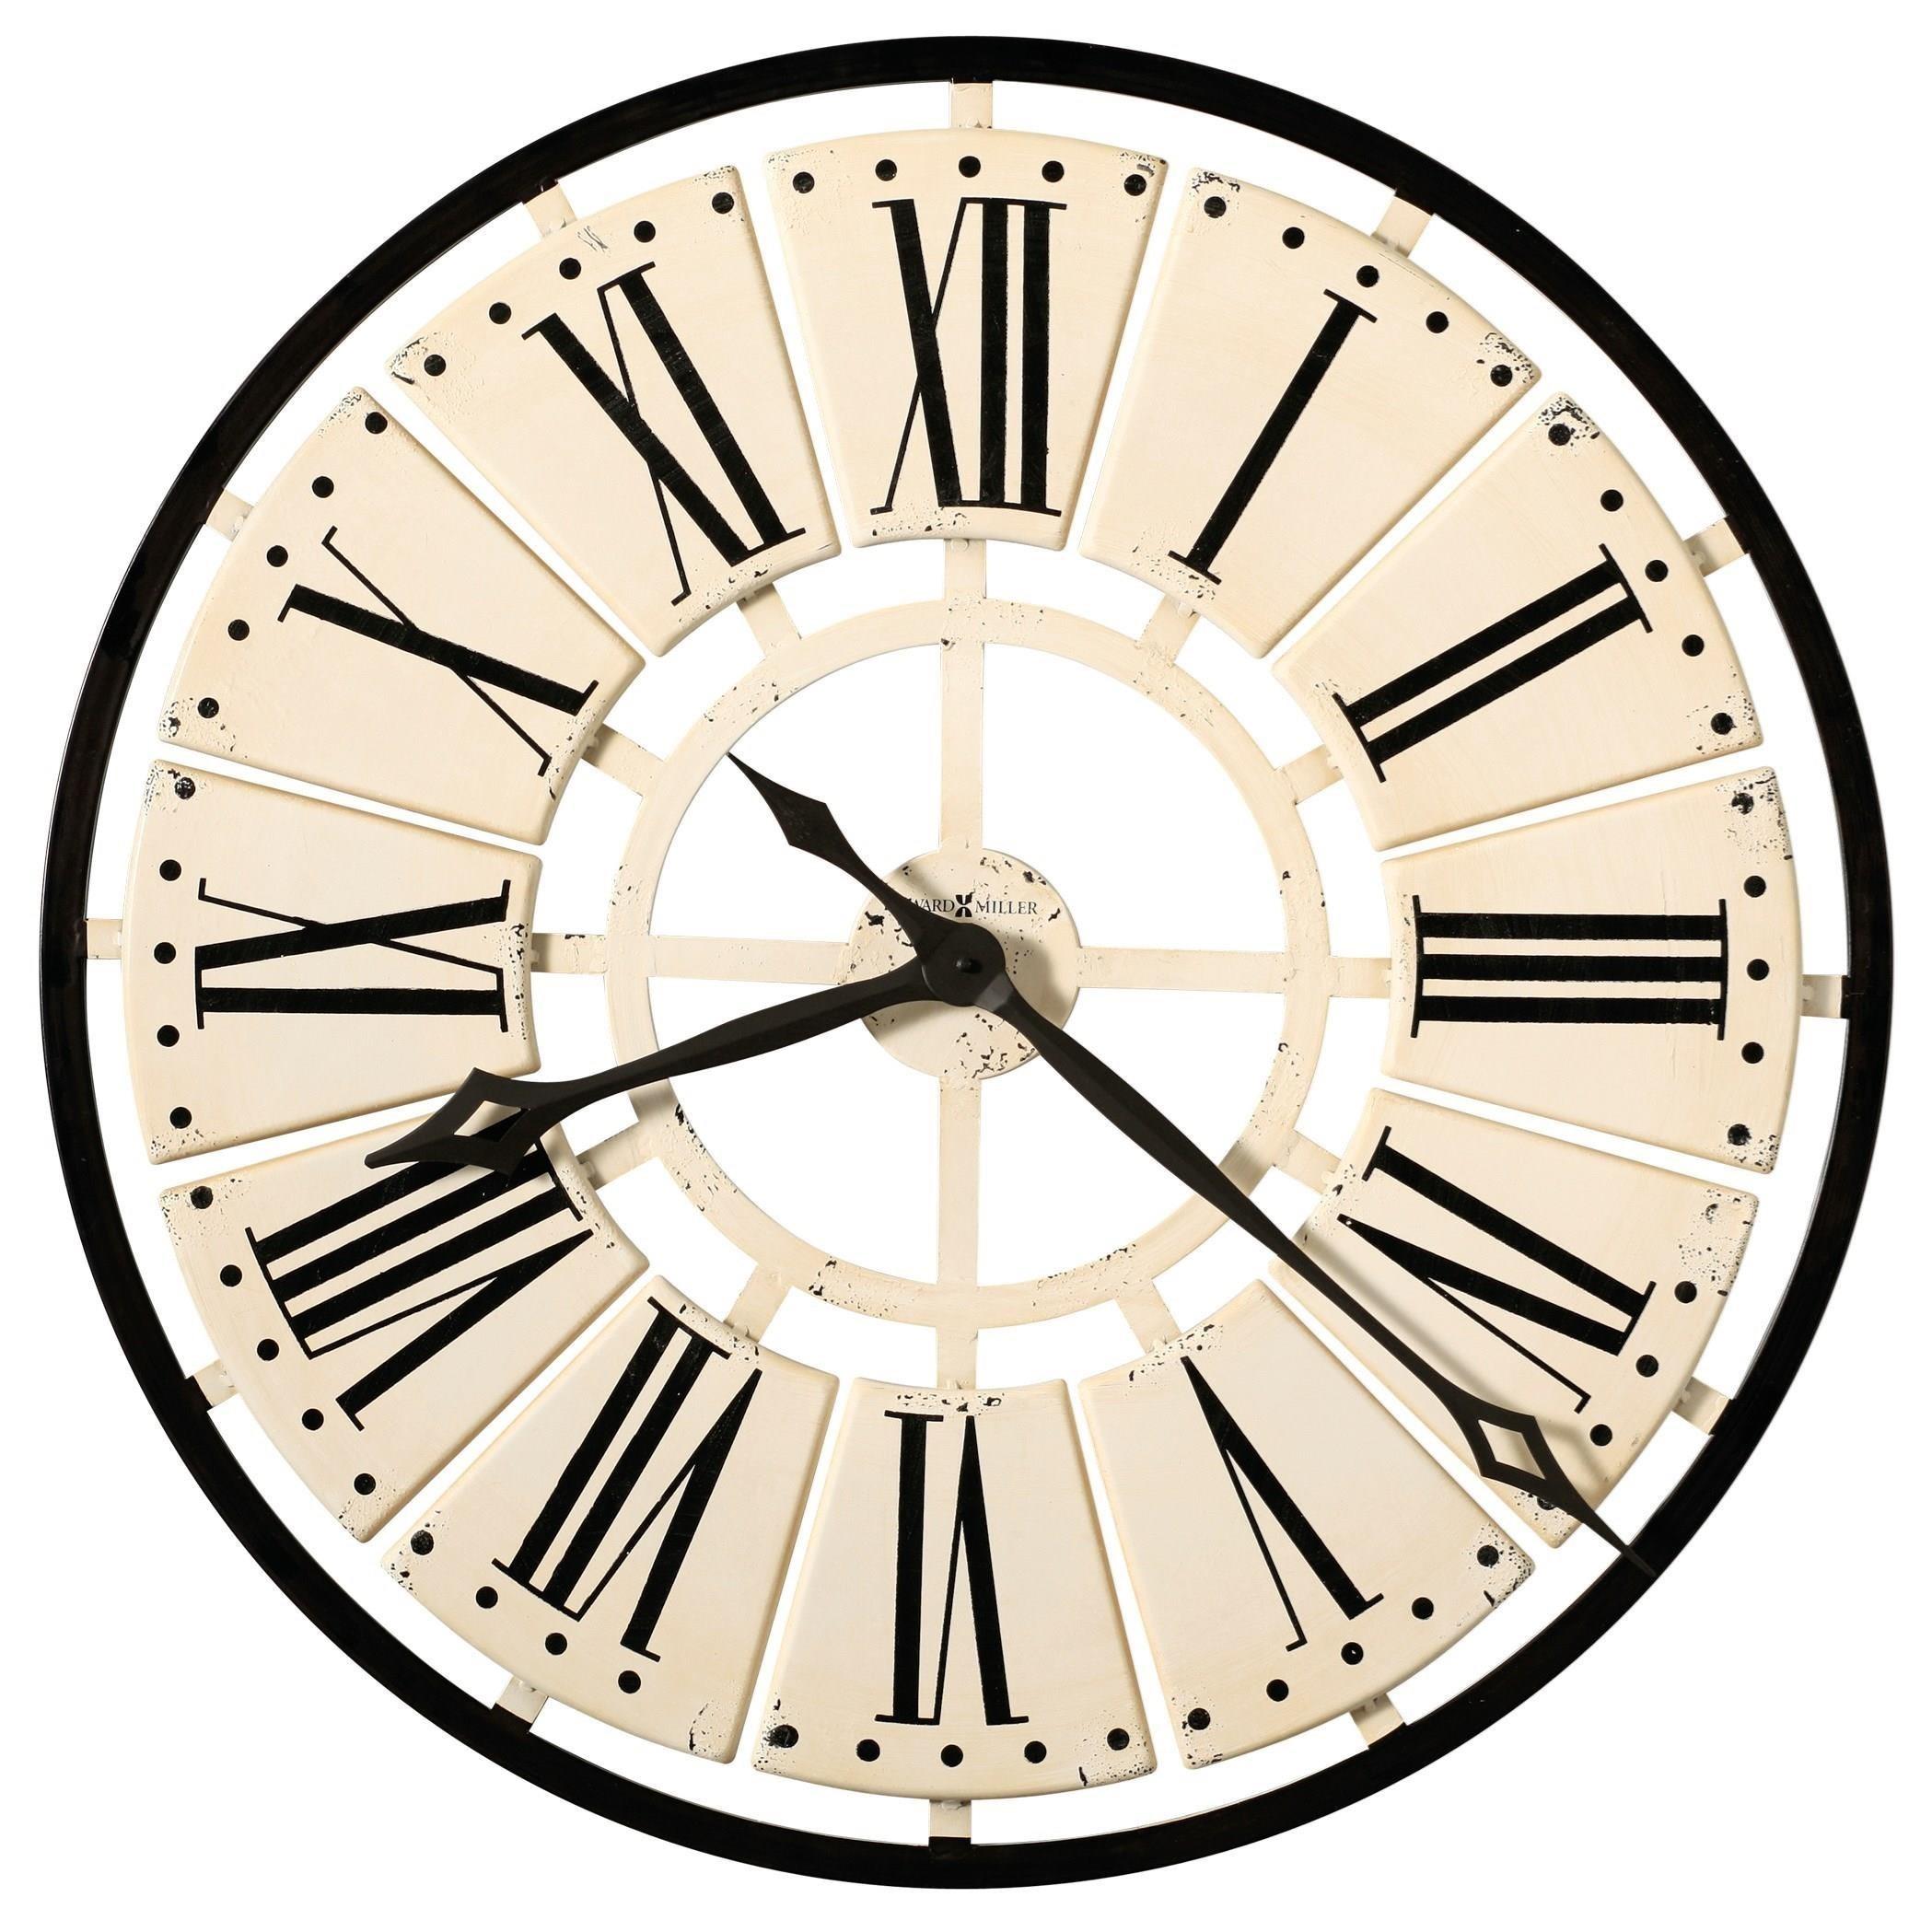 Howard Miller Wall Clocks Wall Clock - Item Number: 625-546